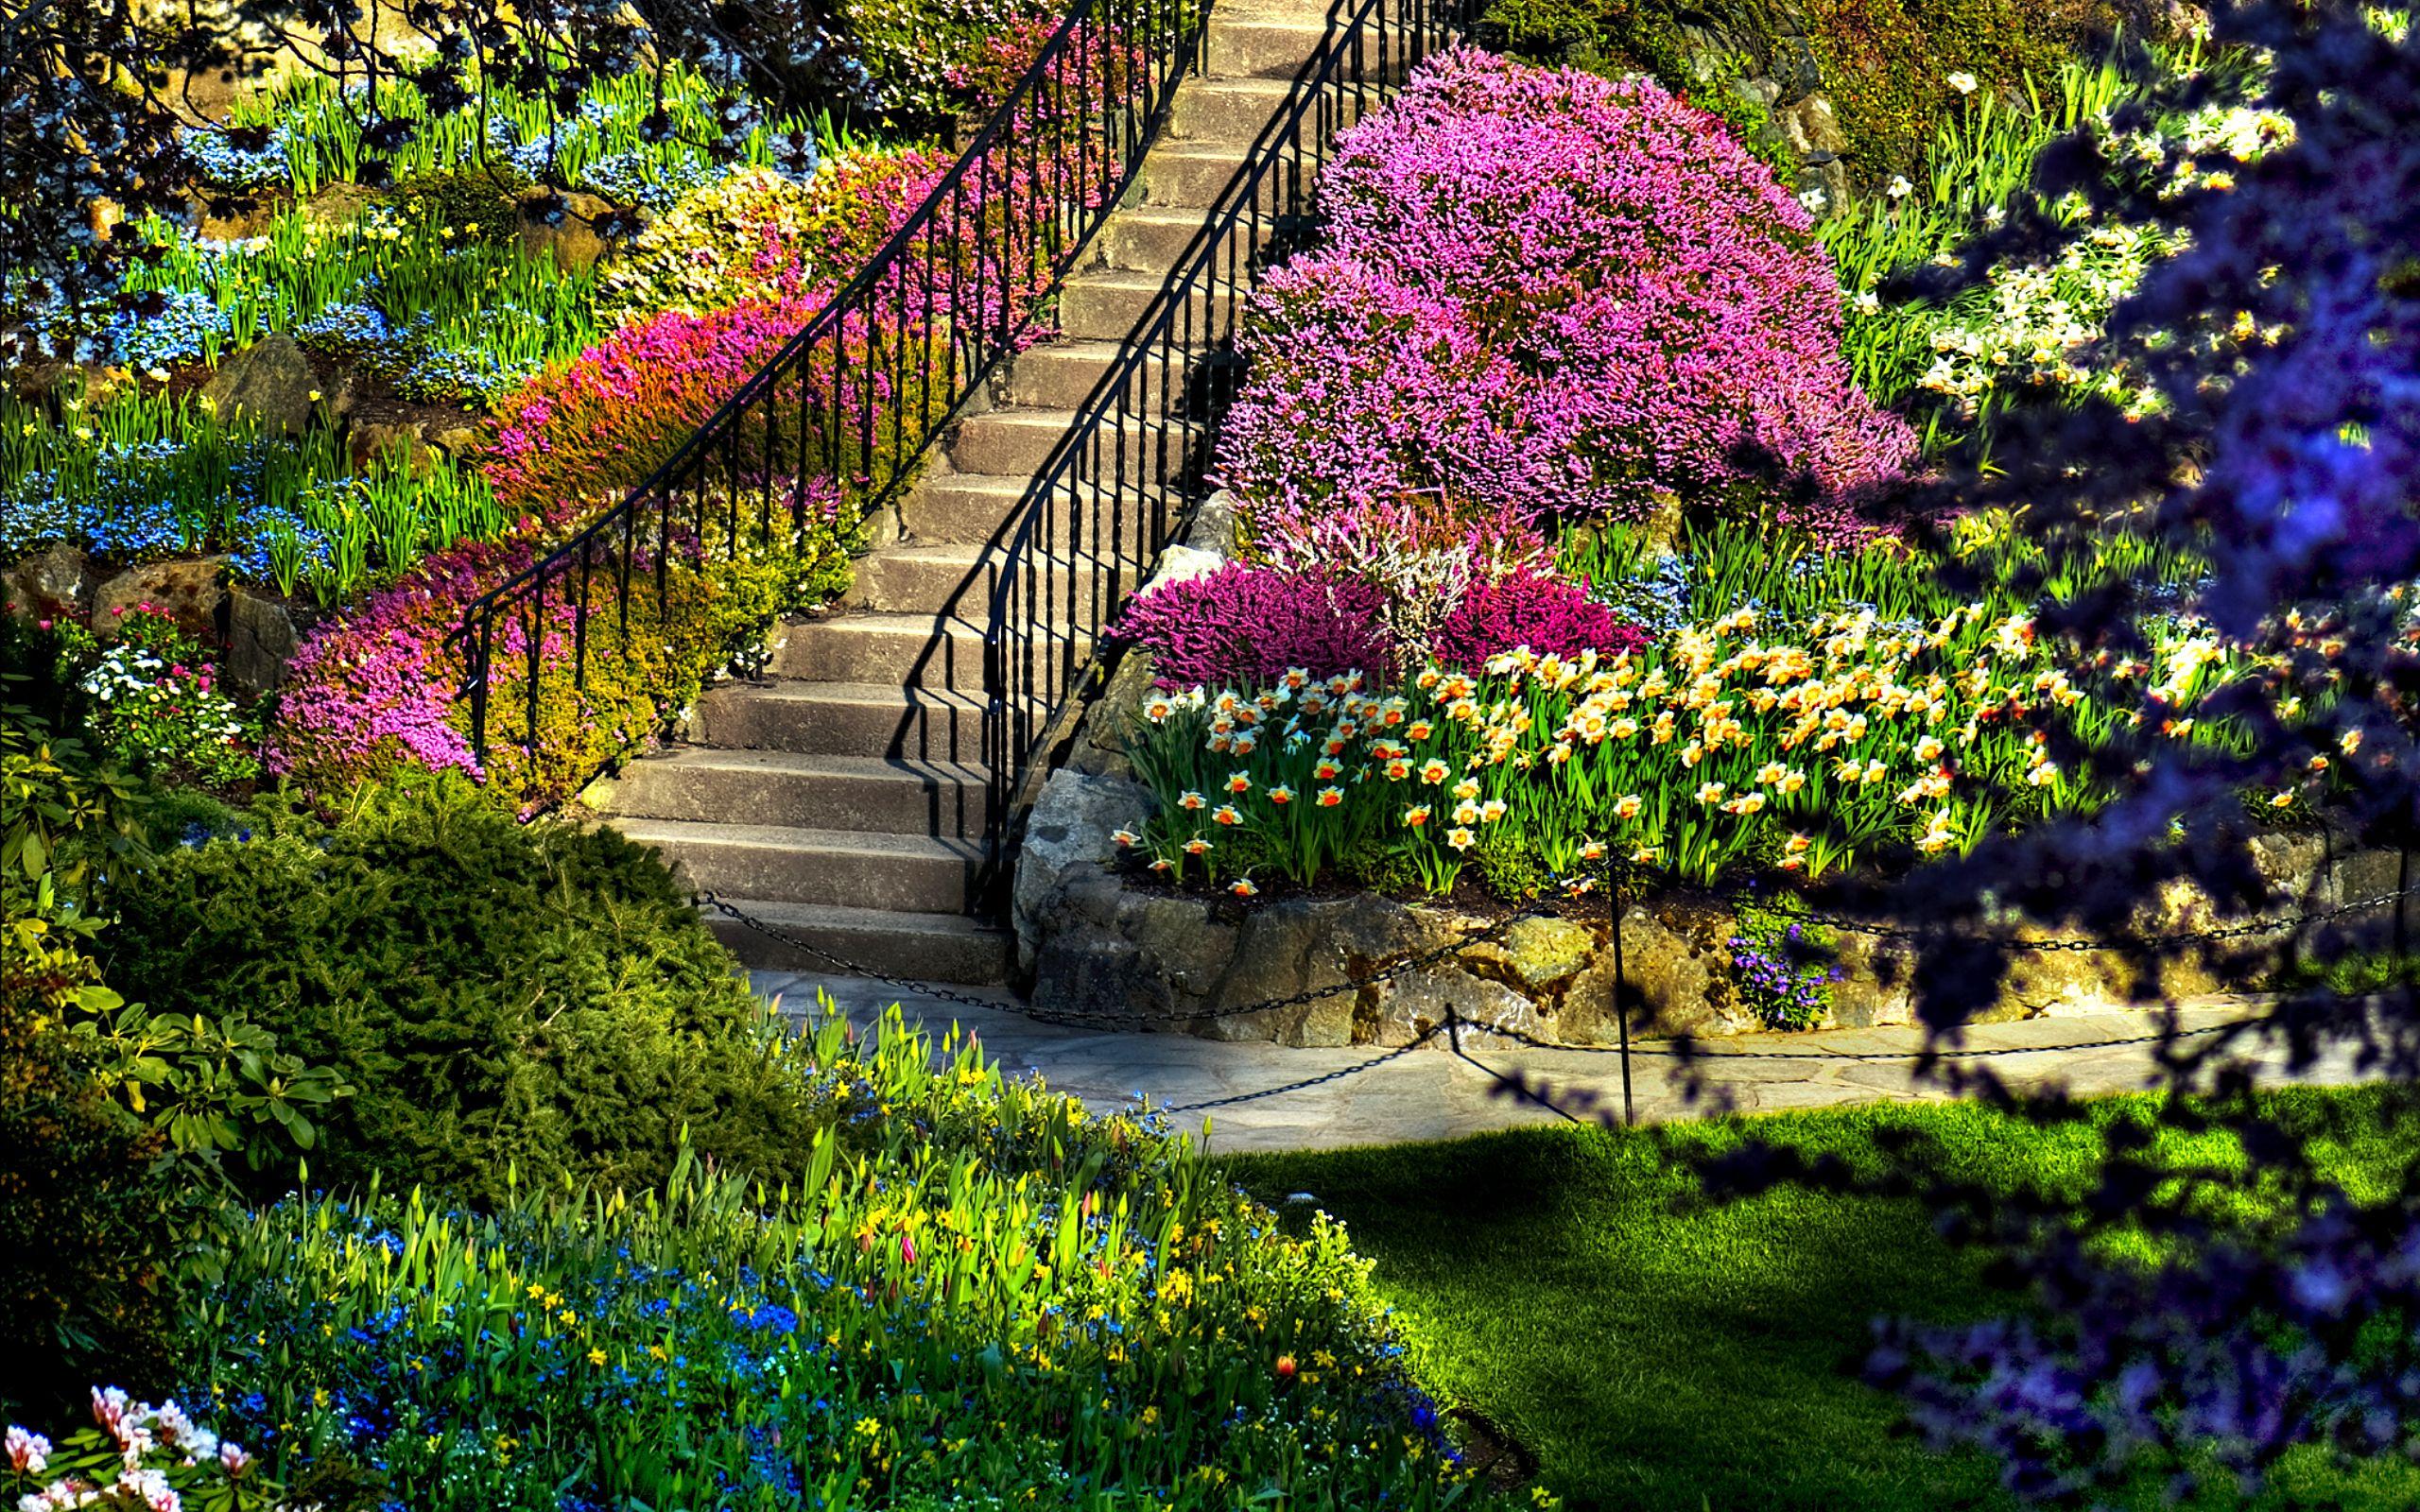 beautiful outdoor gardens beautiful gardens in pictures telegraph garden decor pinterest beautiful gardens gardens and in pictures - Beautiful Gardens